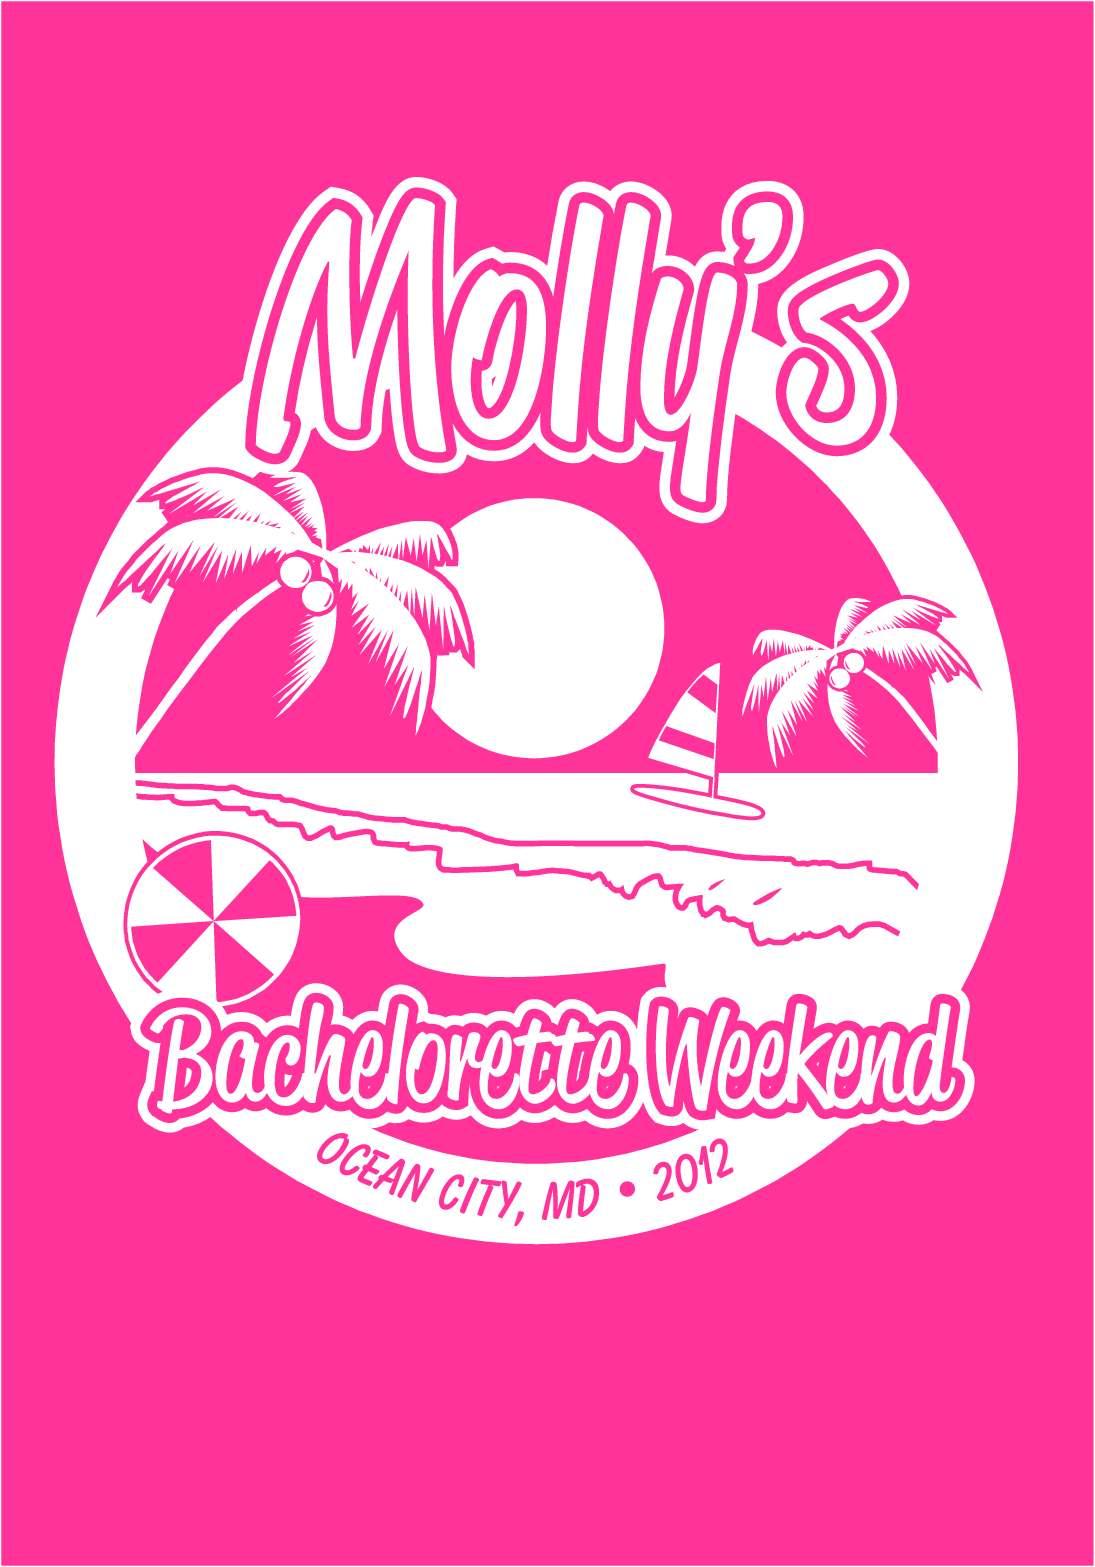 Molly's Bachelorette Weekend